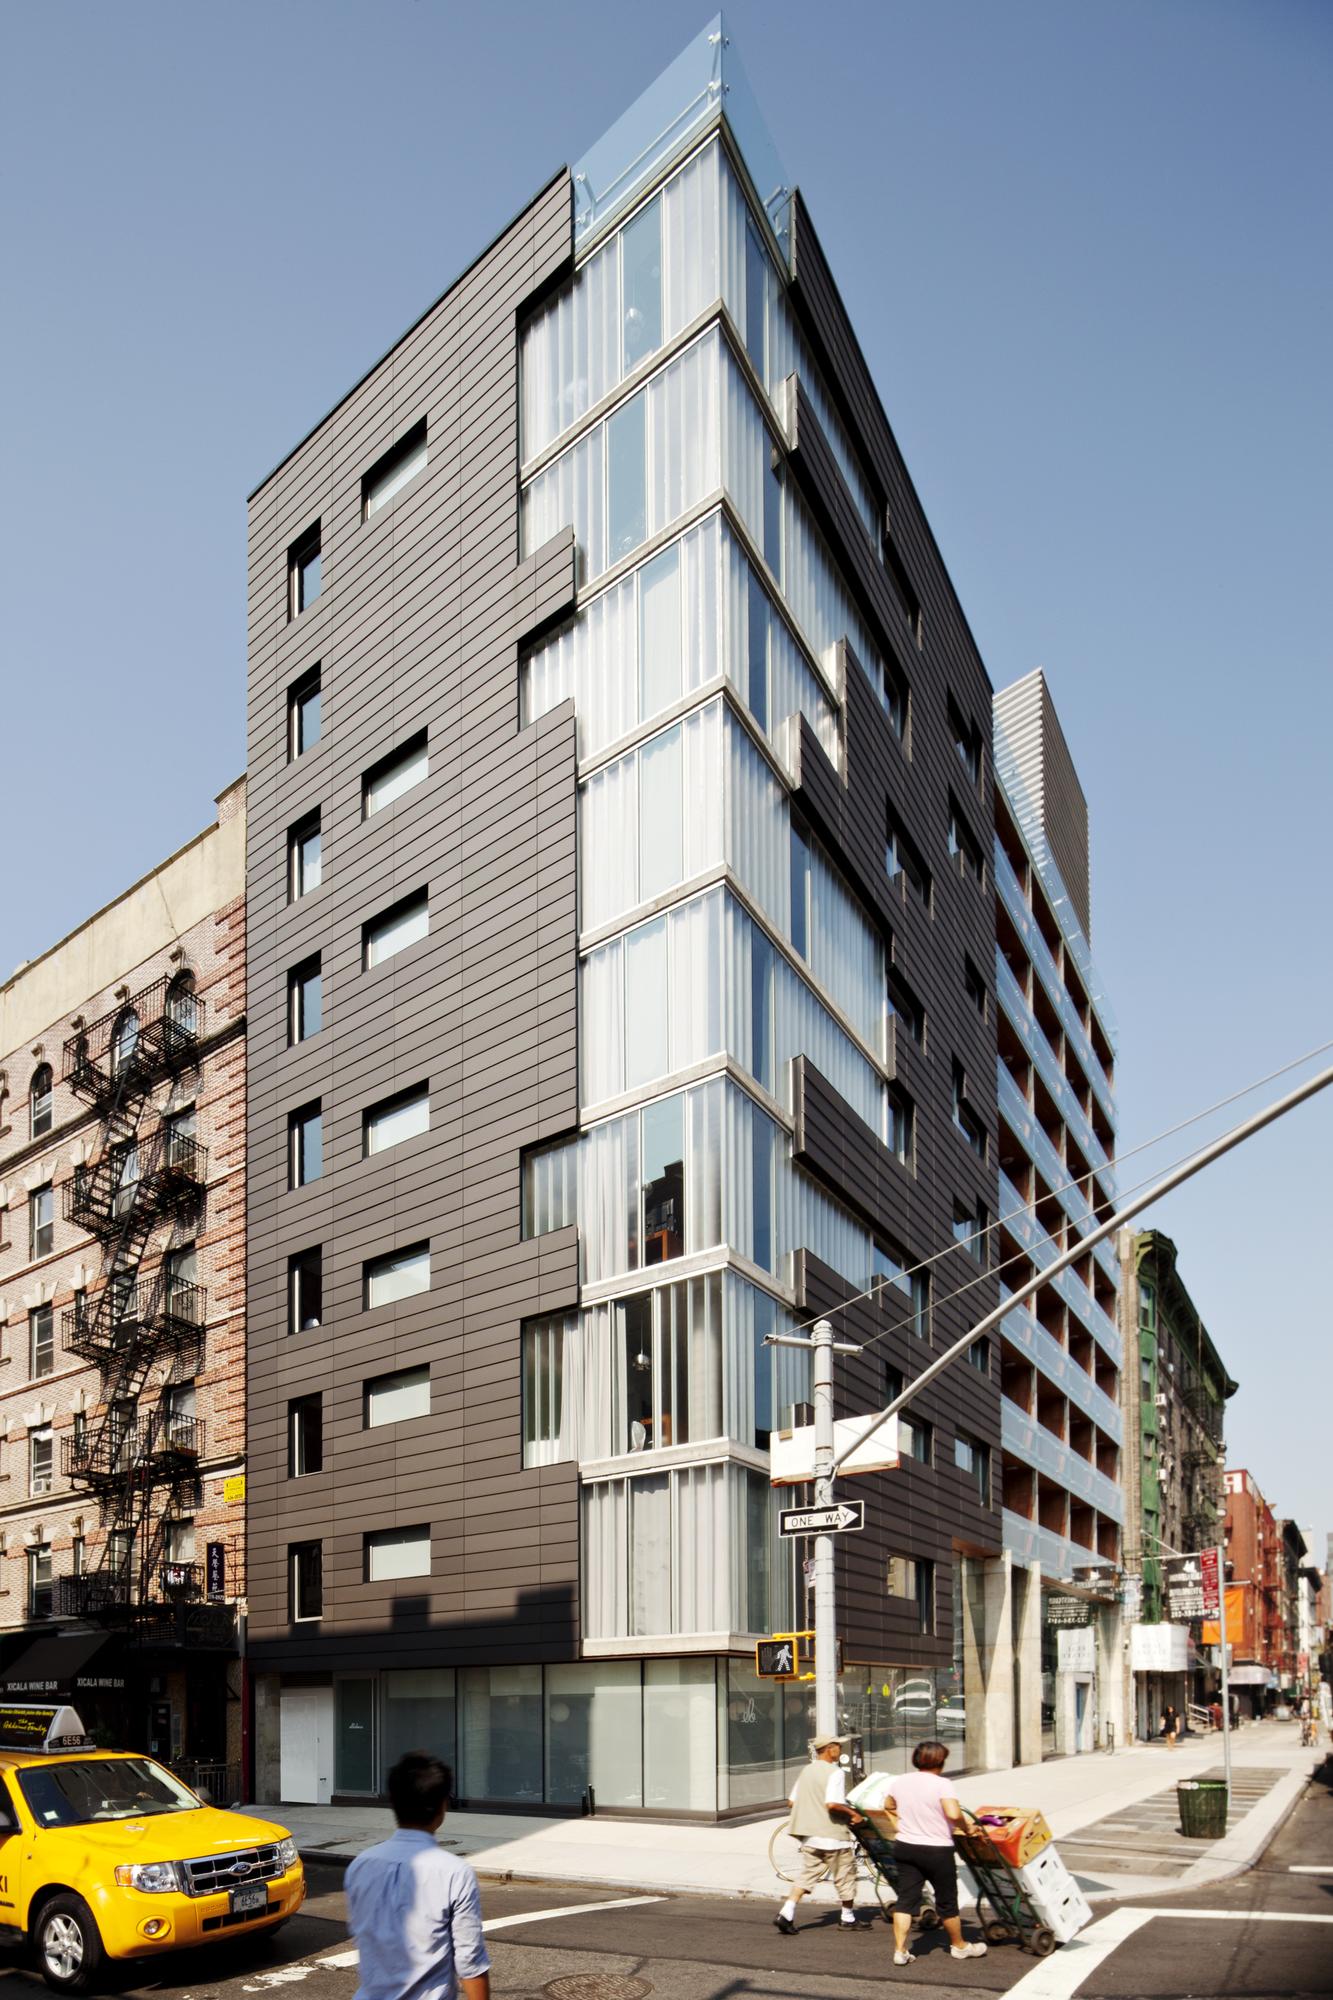 Nolita Hotels NYC | The Nolitan Hotel | Lower Manhattan